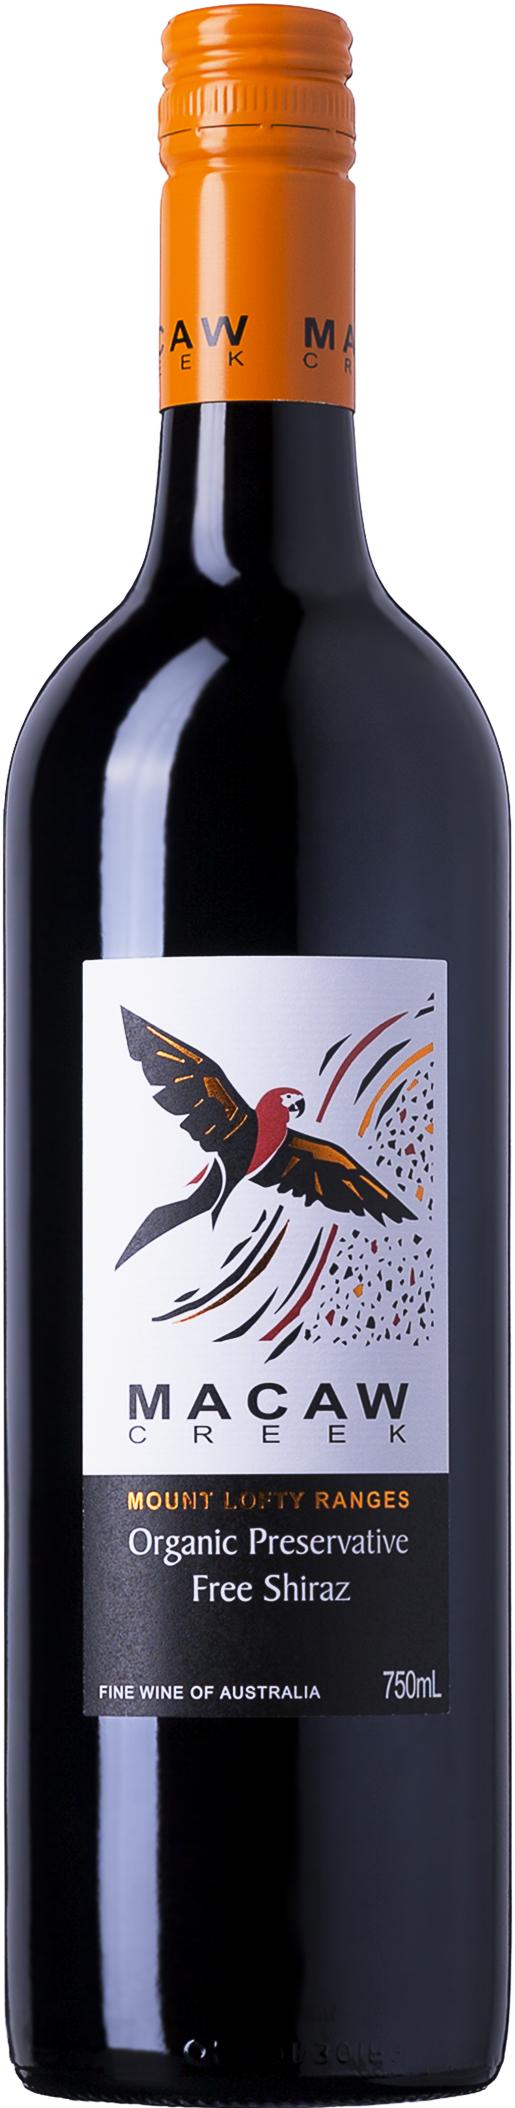 Macaw Creek Organic Semillon-Viognier 2016-2576